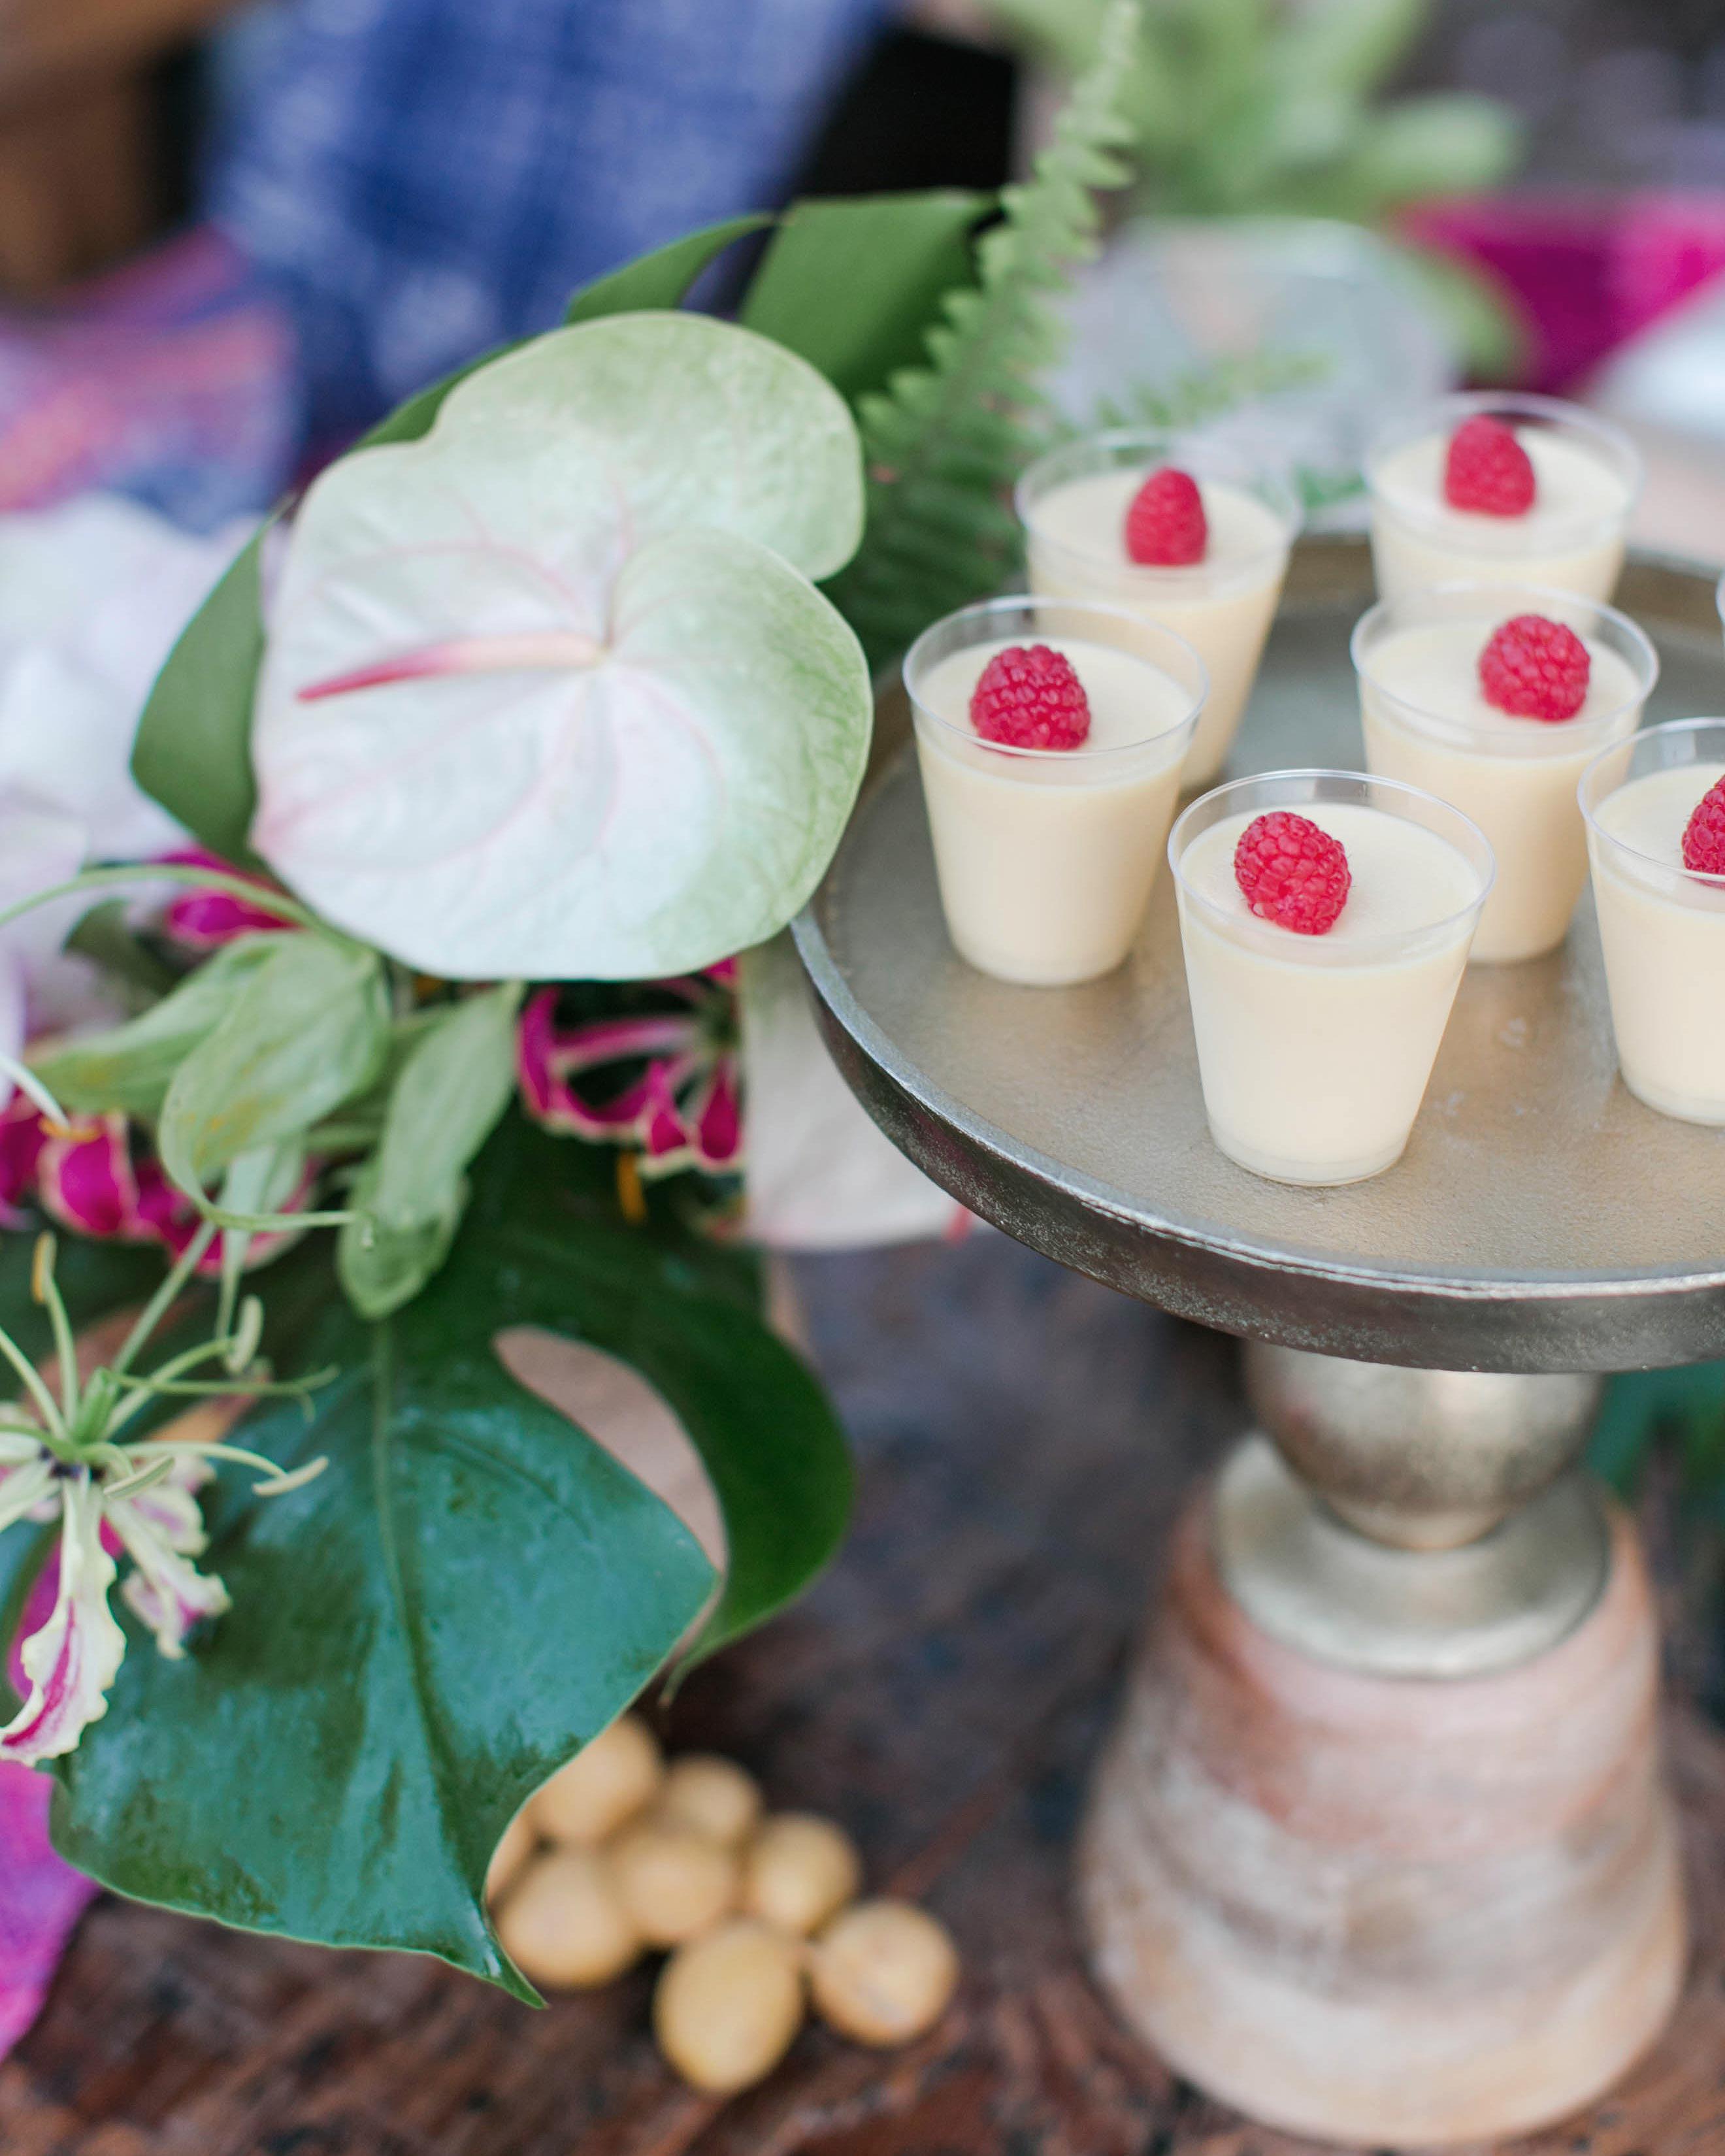 jasmine-jd-anniversary-desserts-077-s112834-0516.jpg